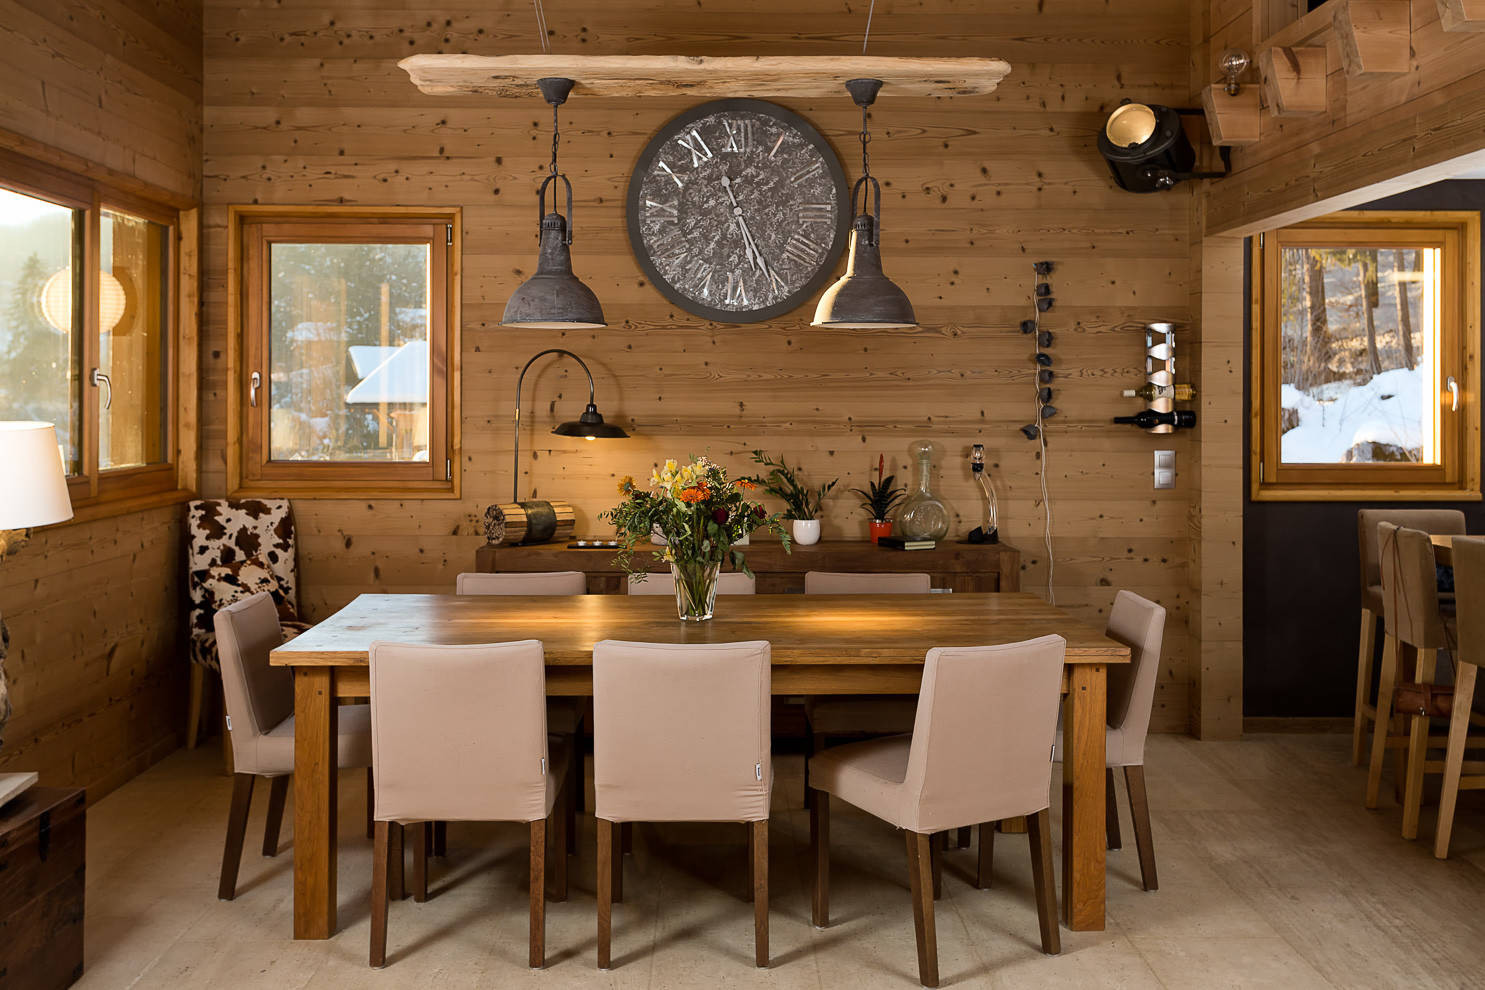 Captivating Rustic Dining Room Designs 16 Majestic Rustic Dining Room Designs You Can T Miss Out